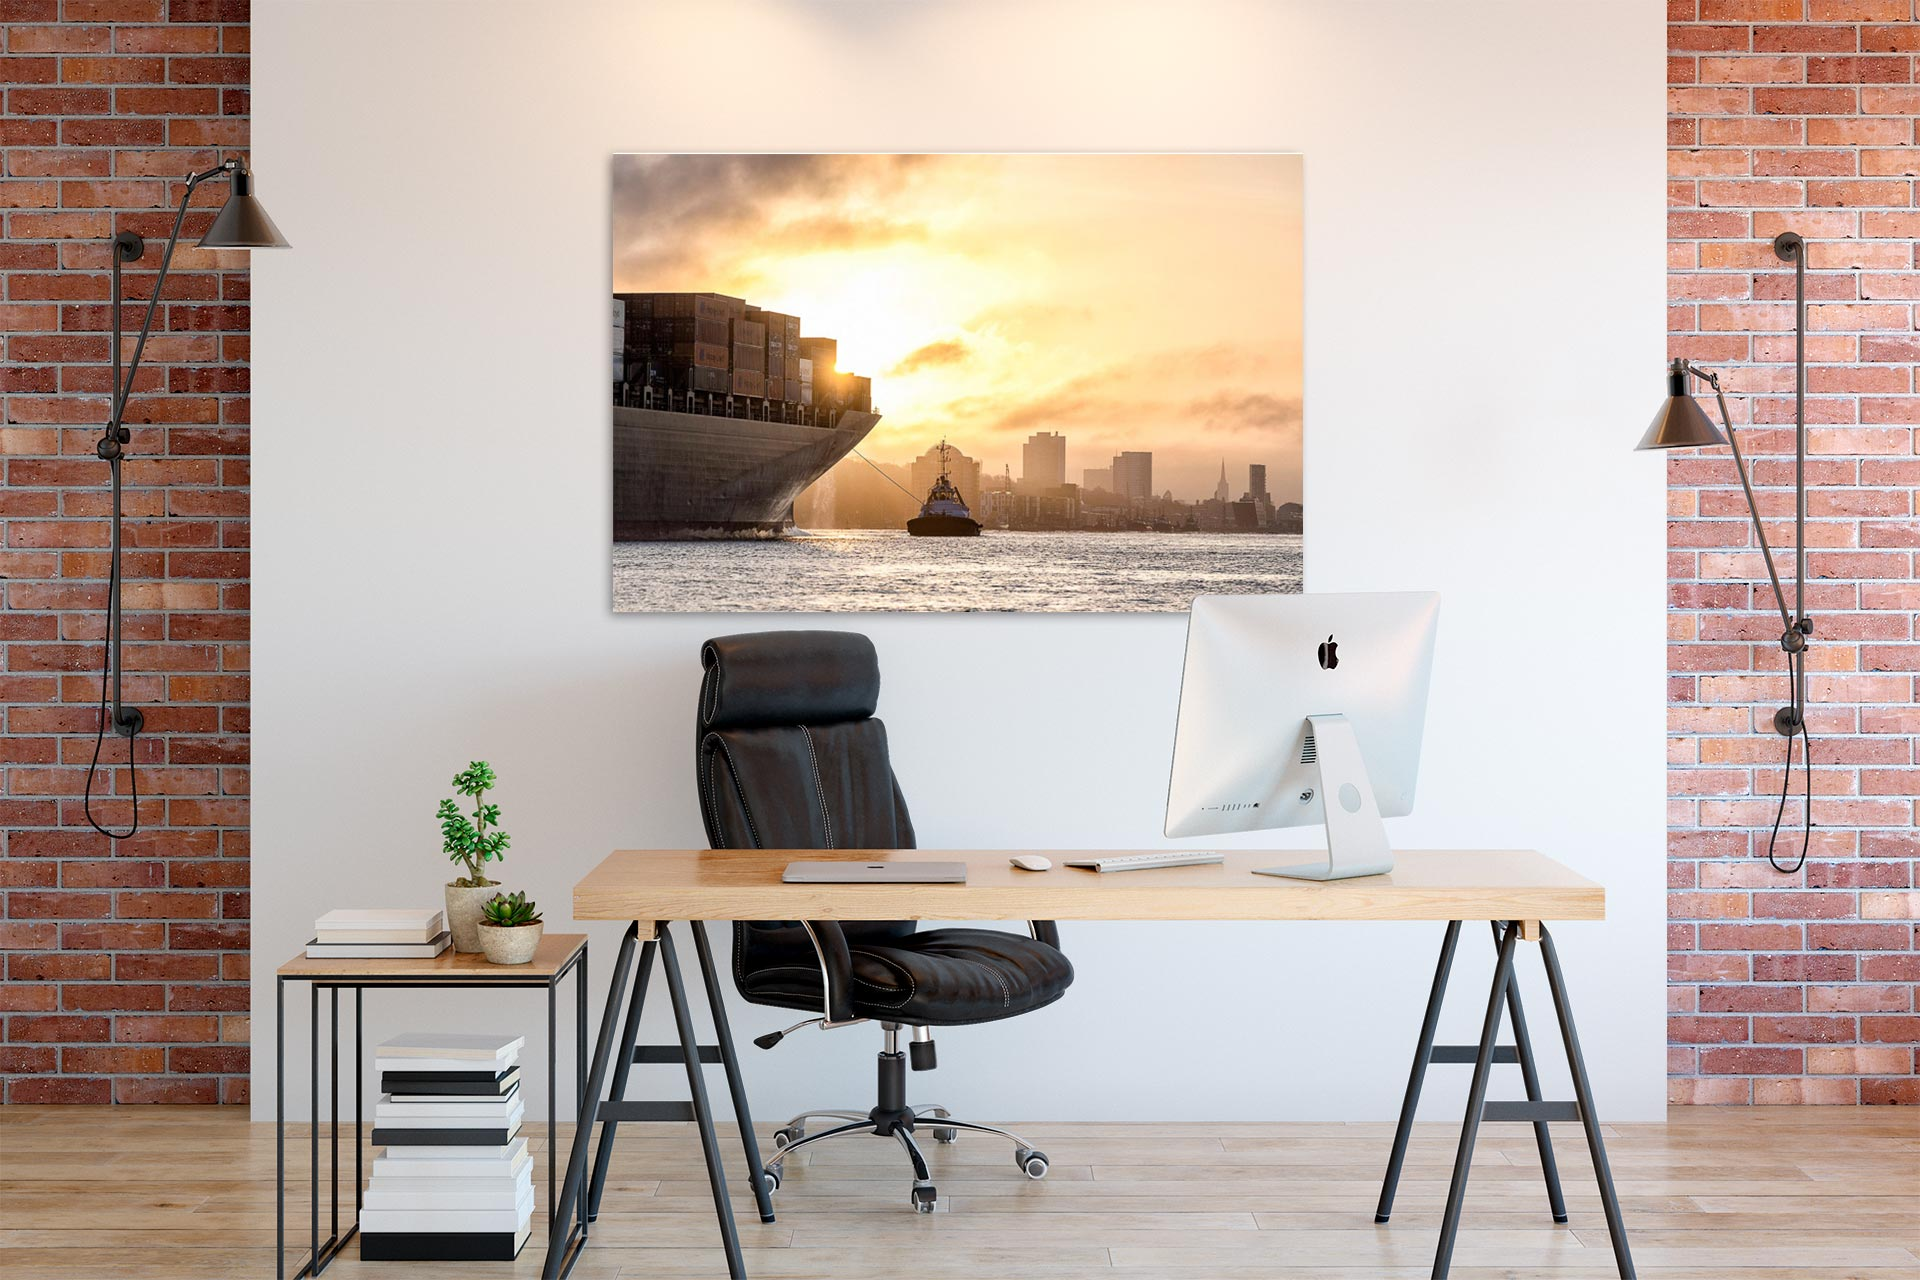 LCW235-fruehschicht-hamburg-wandbild-bild-auf-leinwand-acrylglas-aludibond_buero